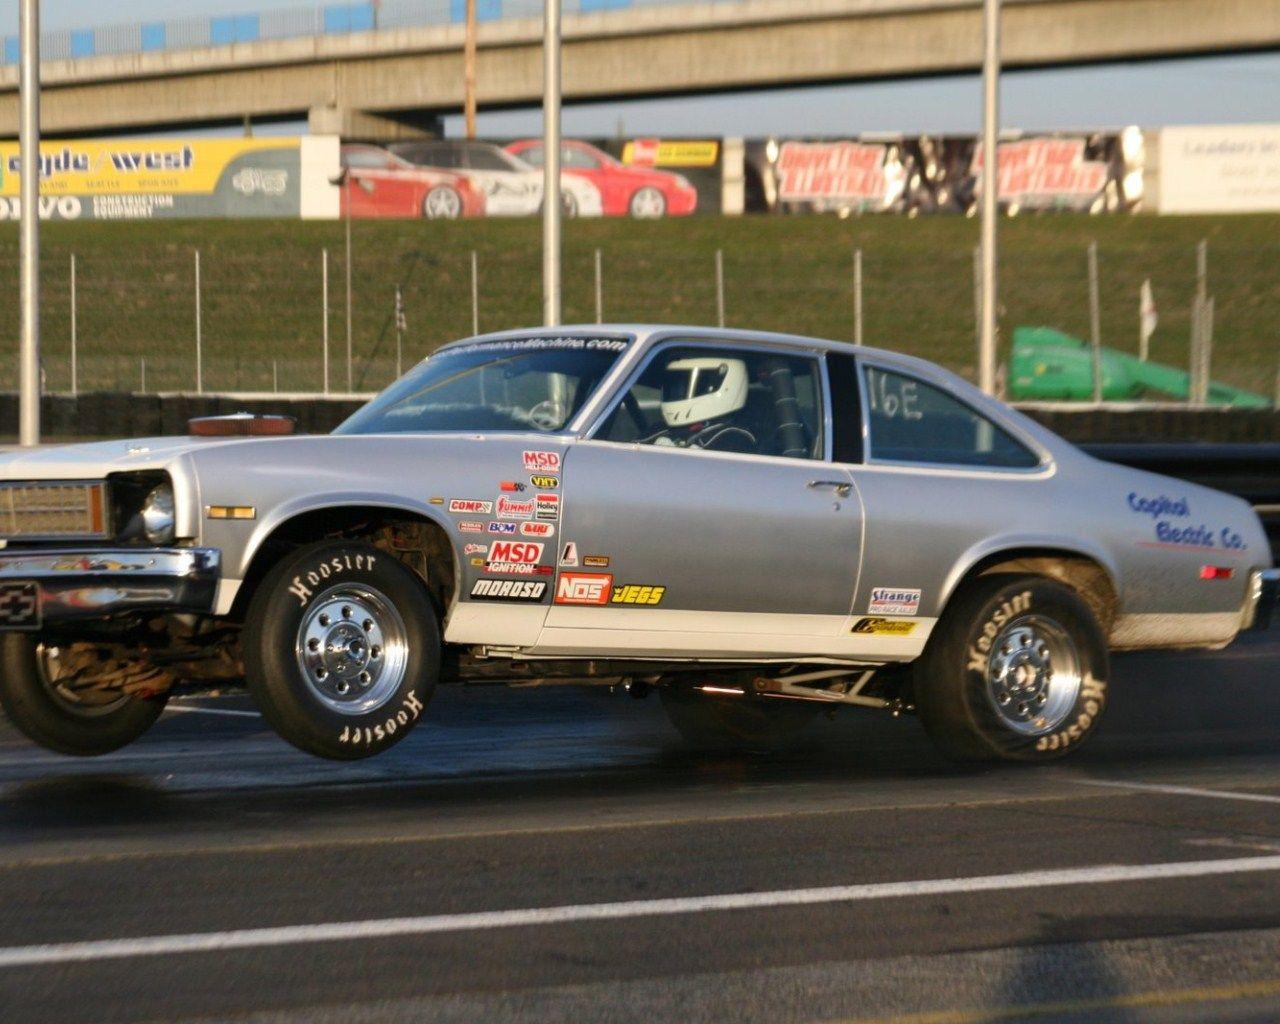 1976 Chevrolet Nova 383 Sbc Nitrous 1 4 Mile Drag Racing Chevrolet Nova Chevrolet Chevy Nova